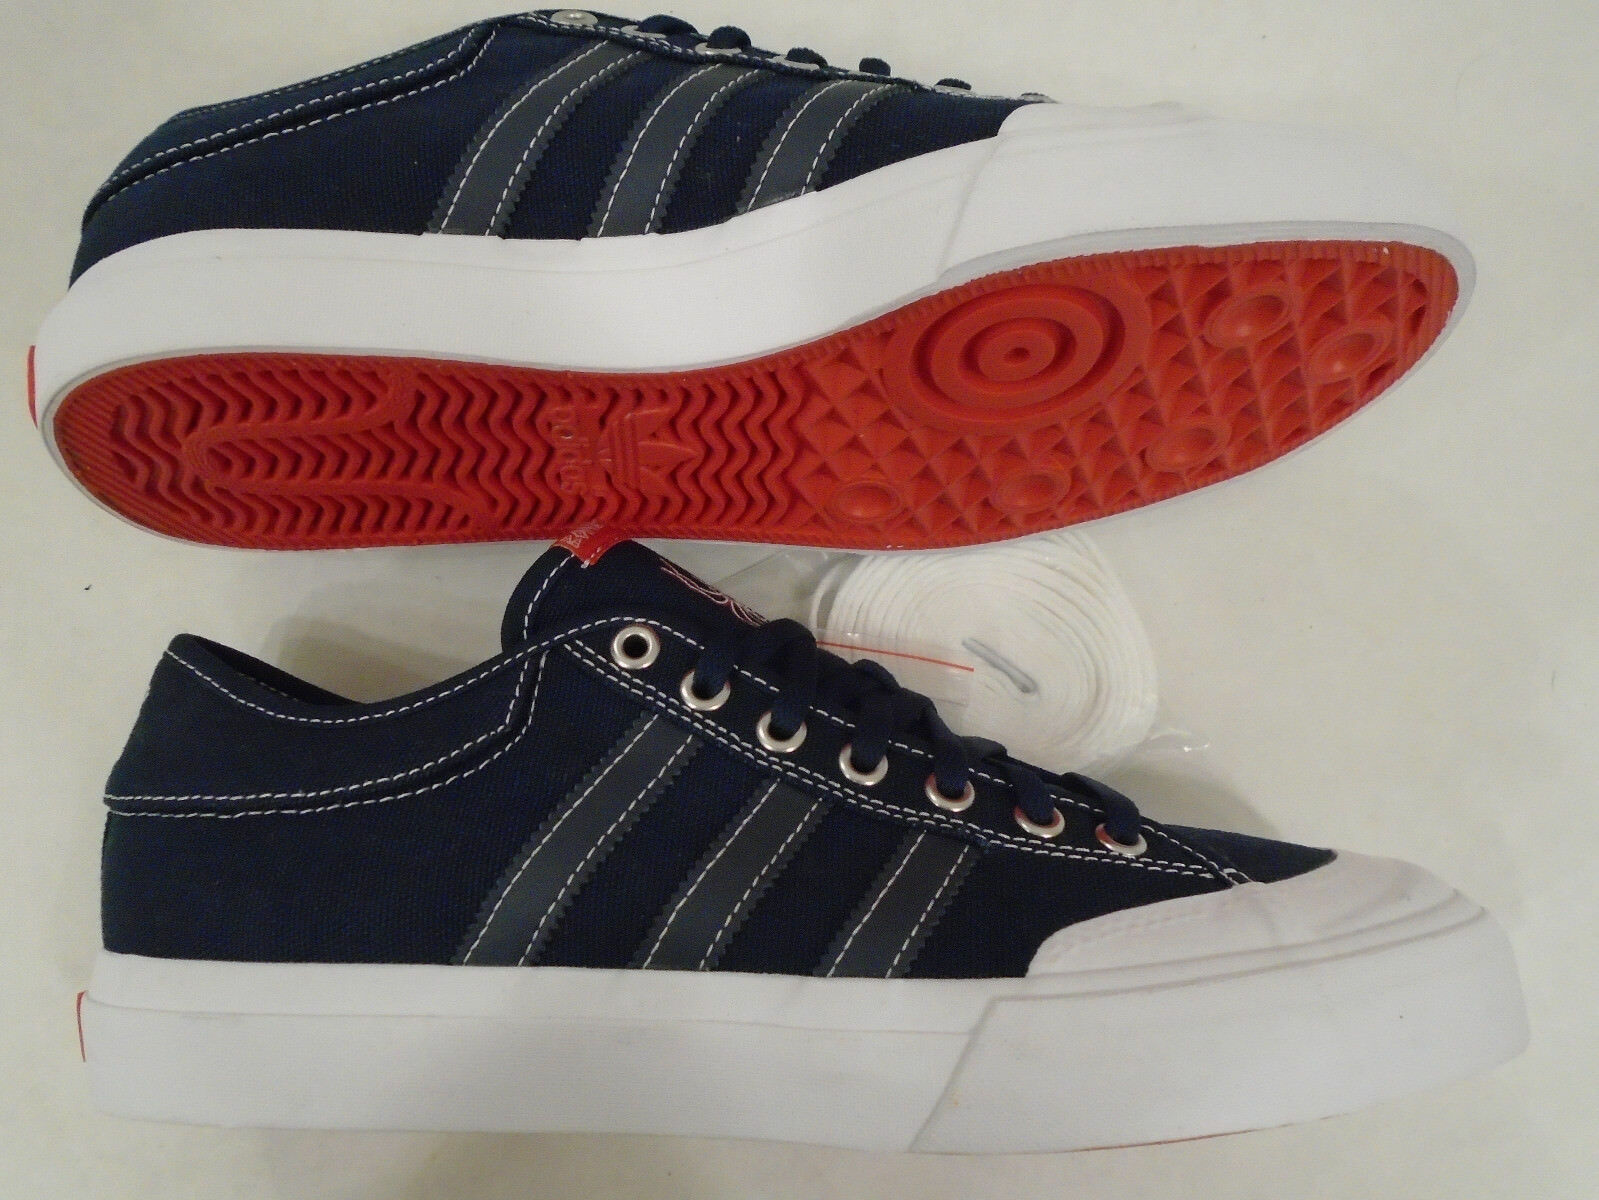 NEW Adidas Size Mens Size Adidas 9 Skateboarding X Bonethrower Matchcourt Shoes Navy CG4870 4b850c